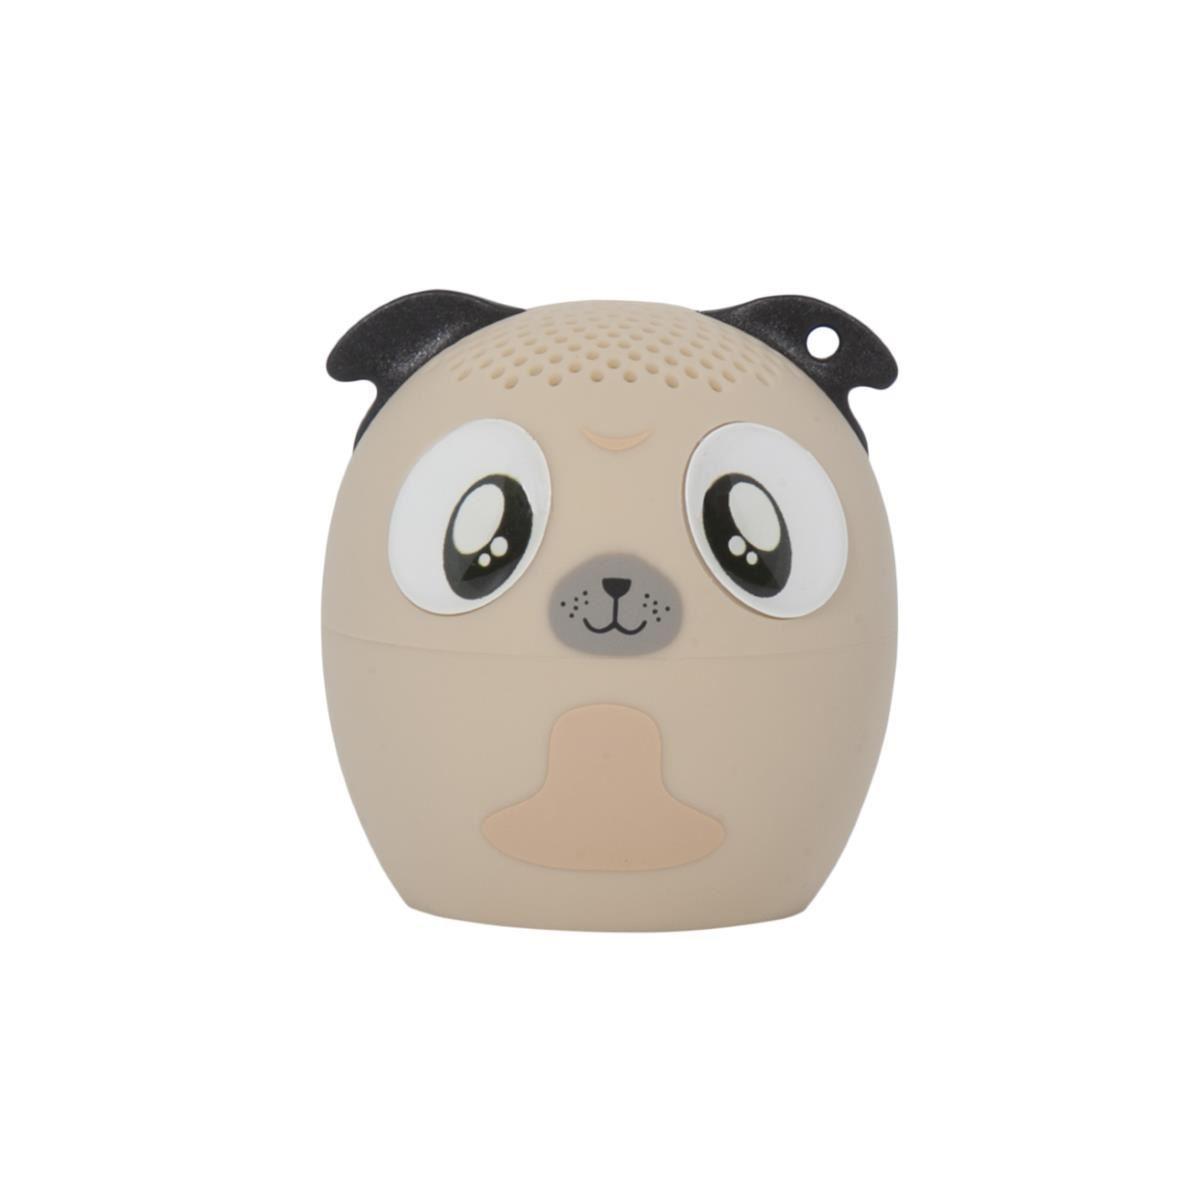 Mini Bluetooth Animal Speakers Portable Wireless Travel